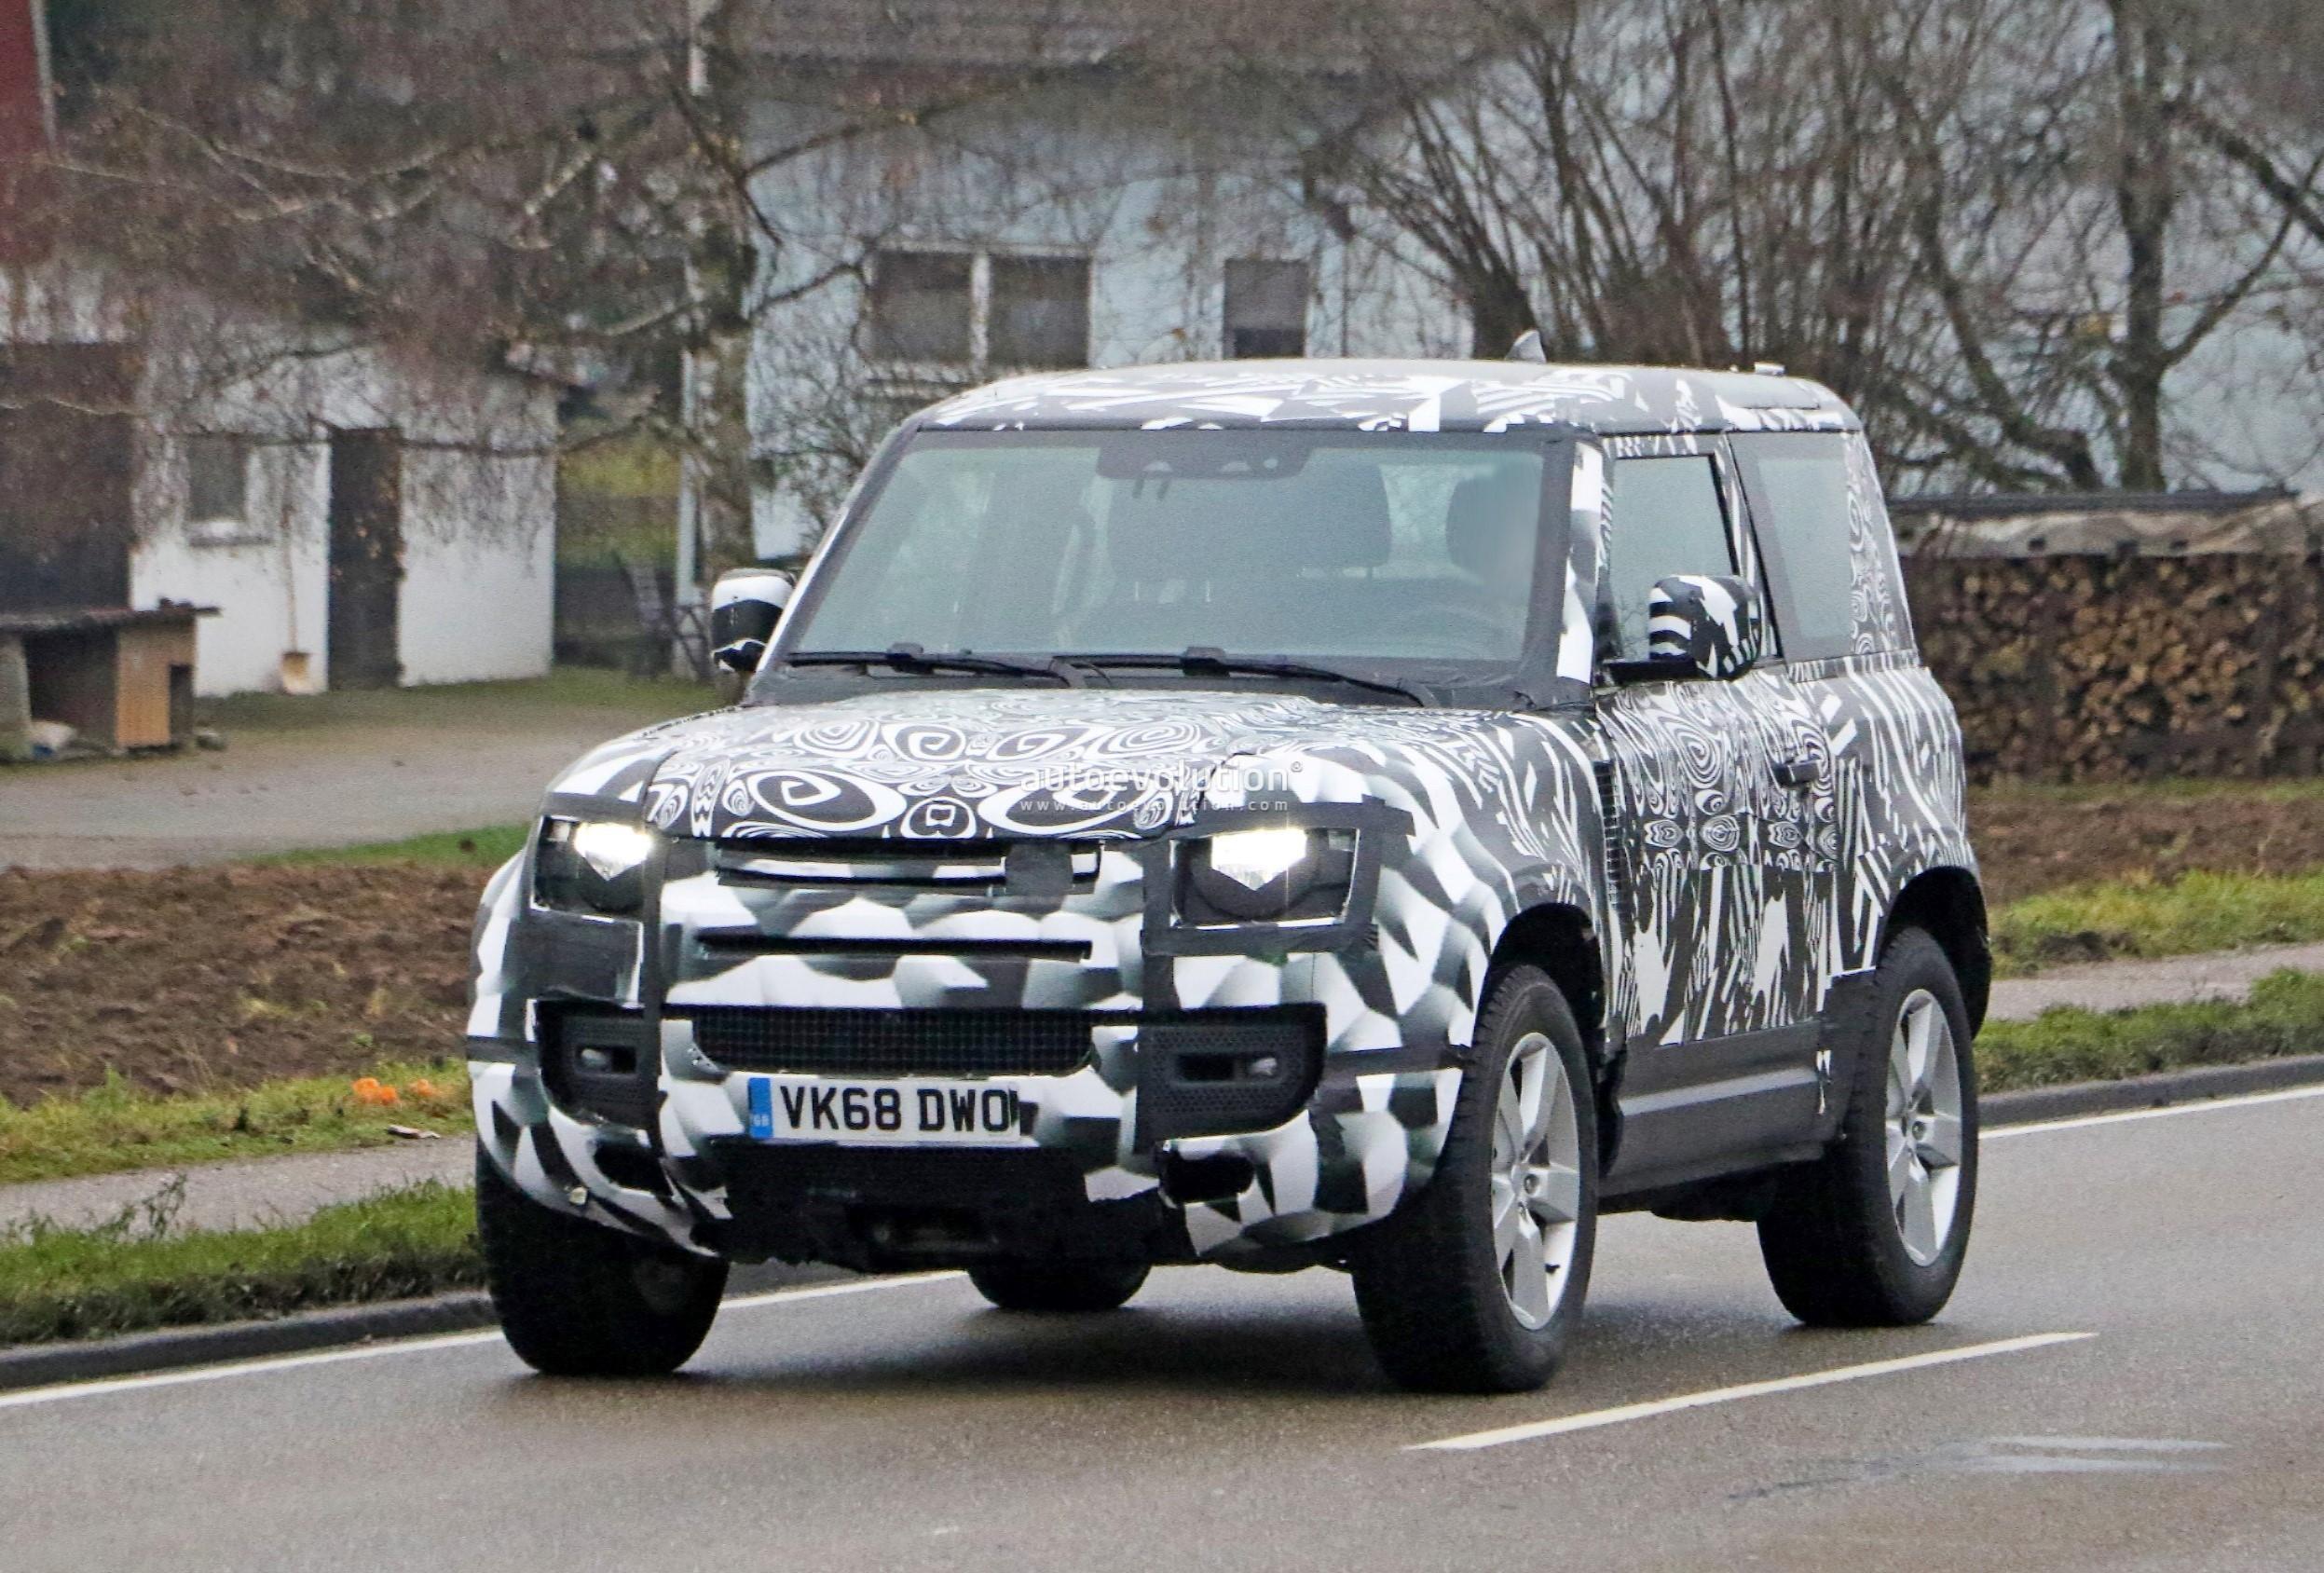 2022 Land Rover Defender V8 Spied With Short Wheelbase ...